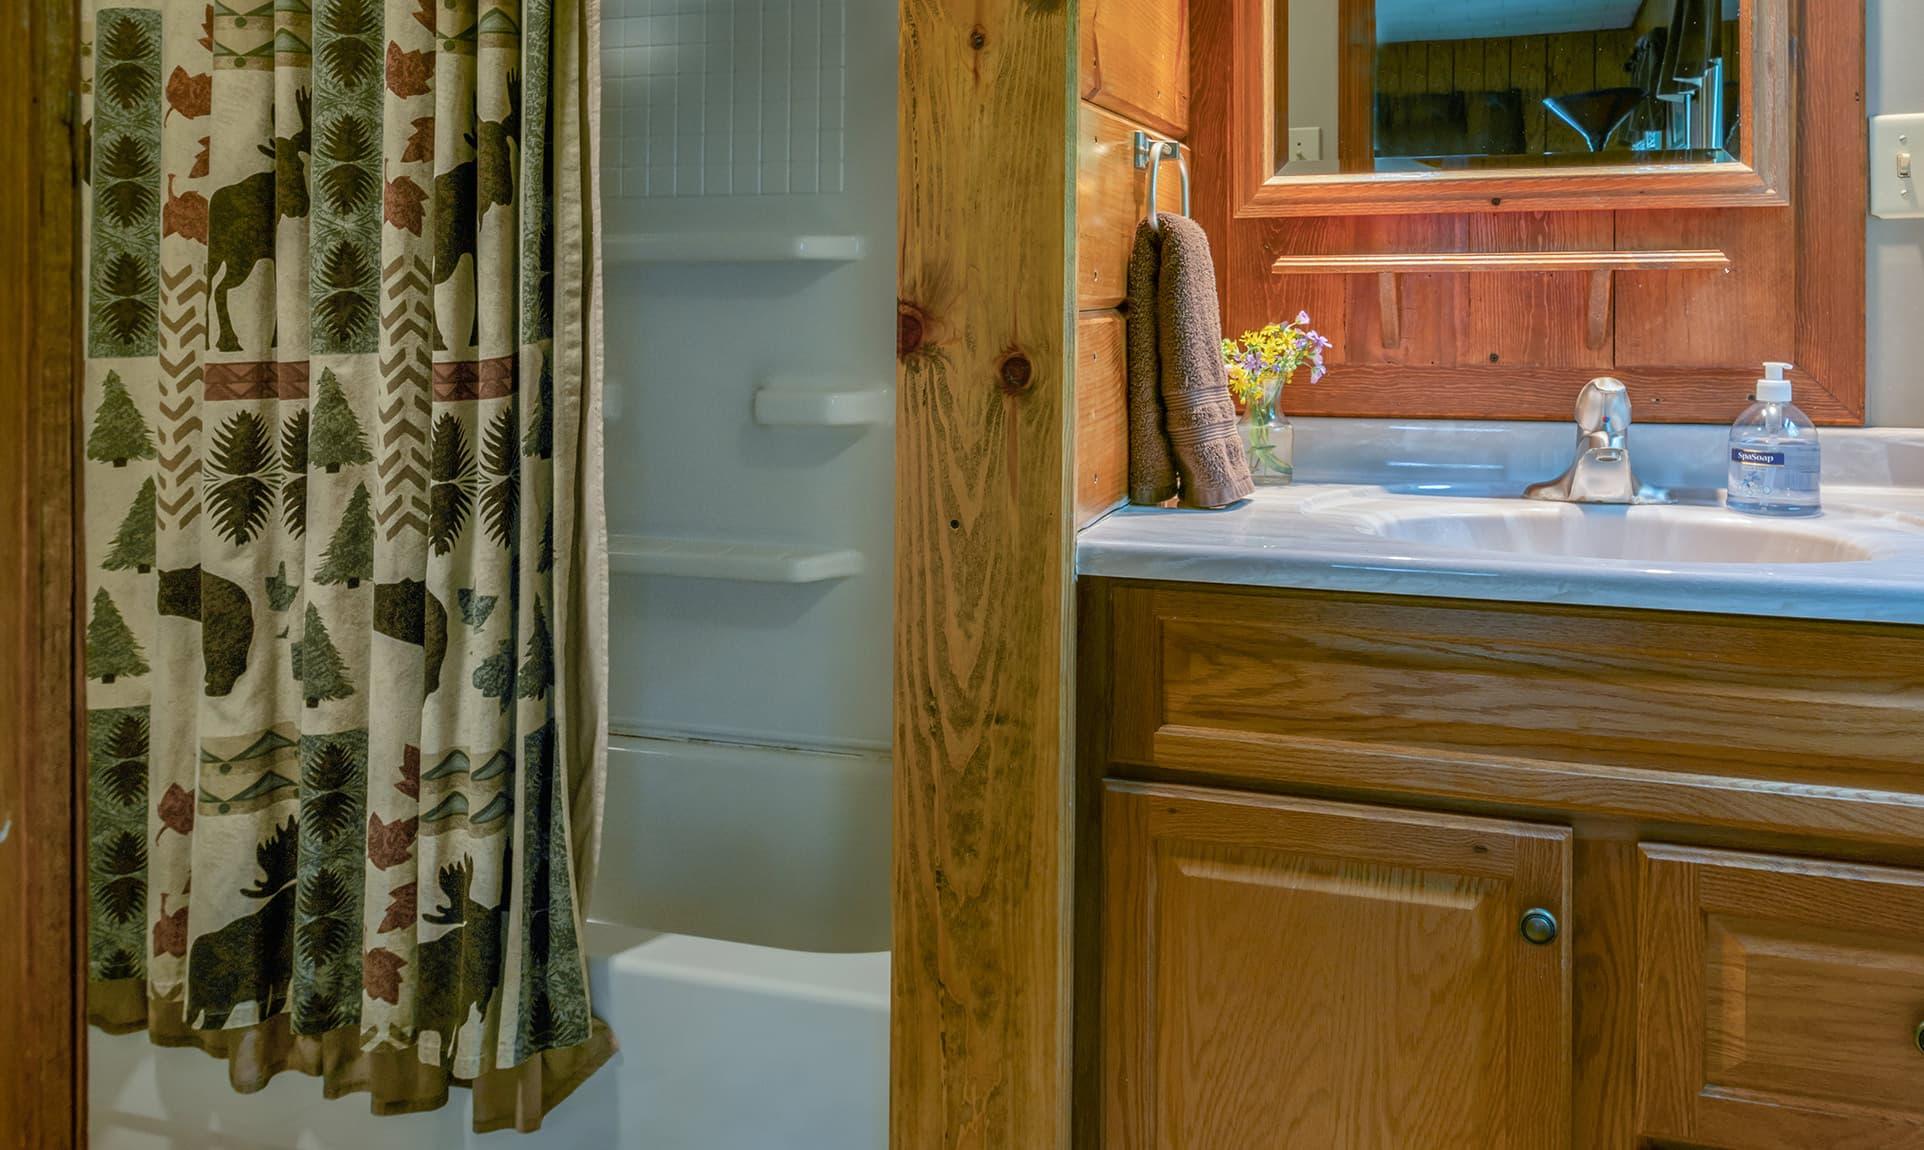 Bridge Cabin bathroom - romantic accommodations near Starved Rock